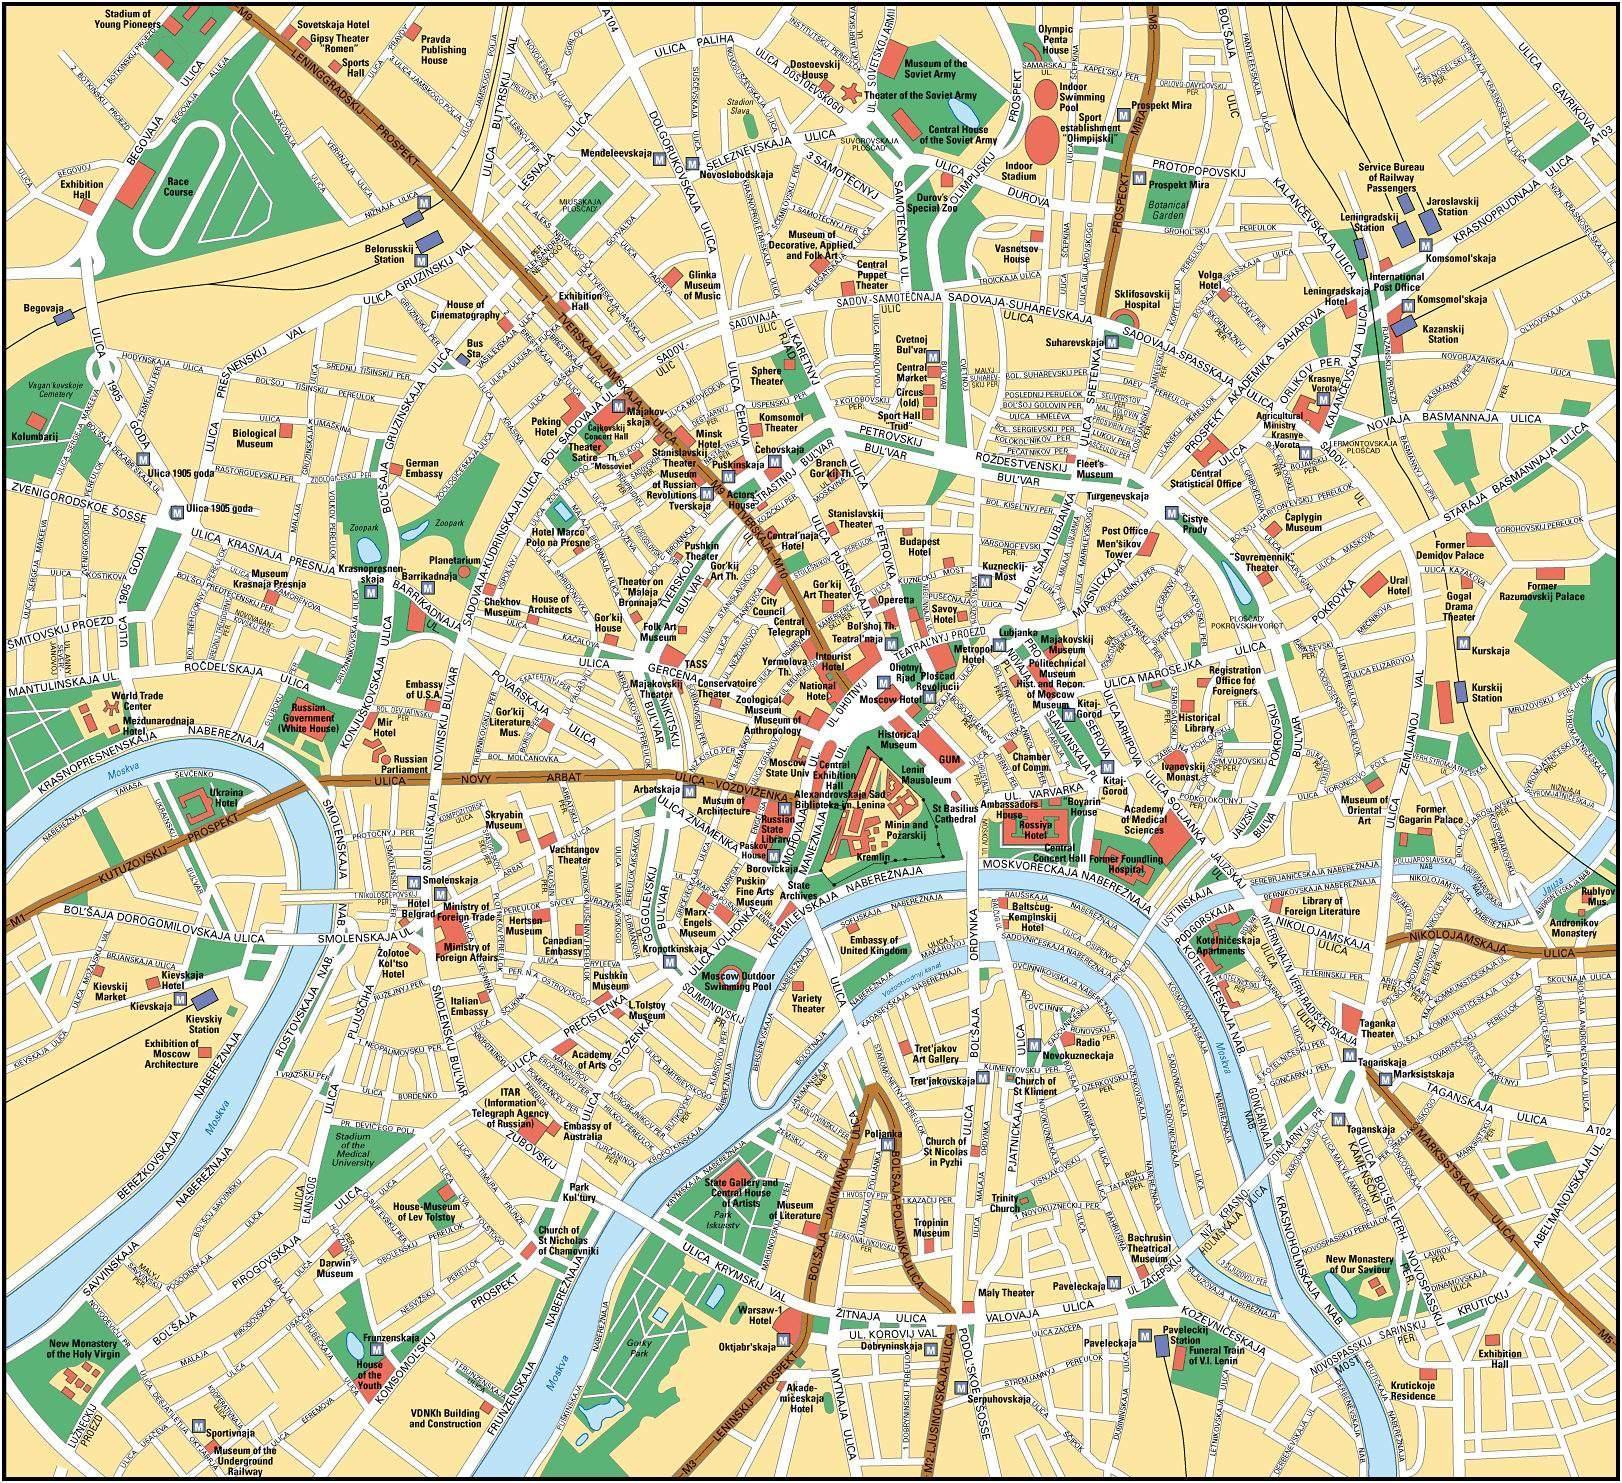 moskva karta Moskva karta   Moskva Kreml karta (Ryssland) moskva karta